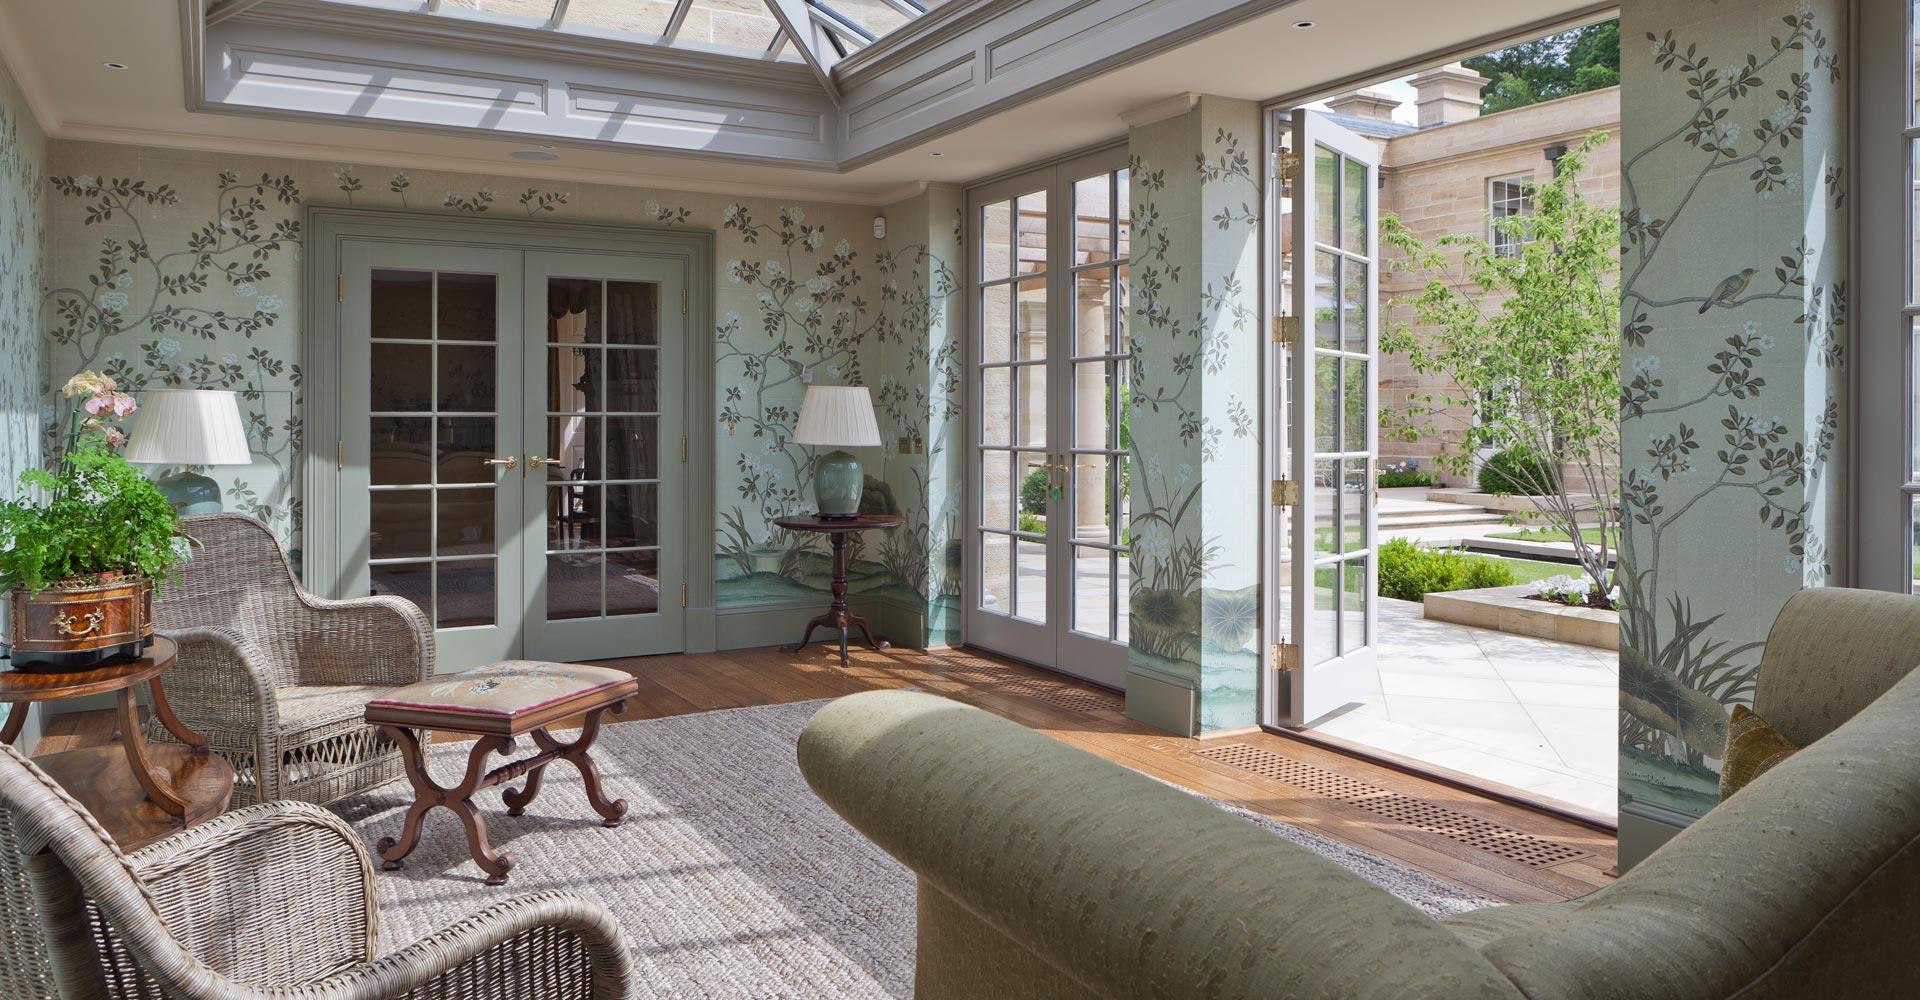 Orangeries bespoke orangeries by vale garden houses for Orangery interior design ideas